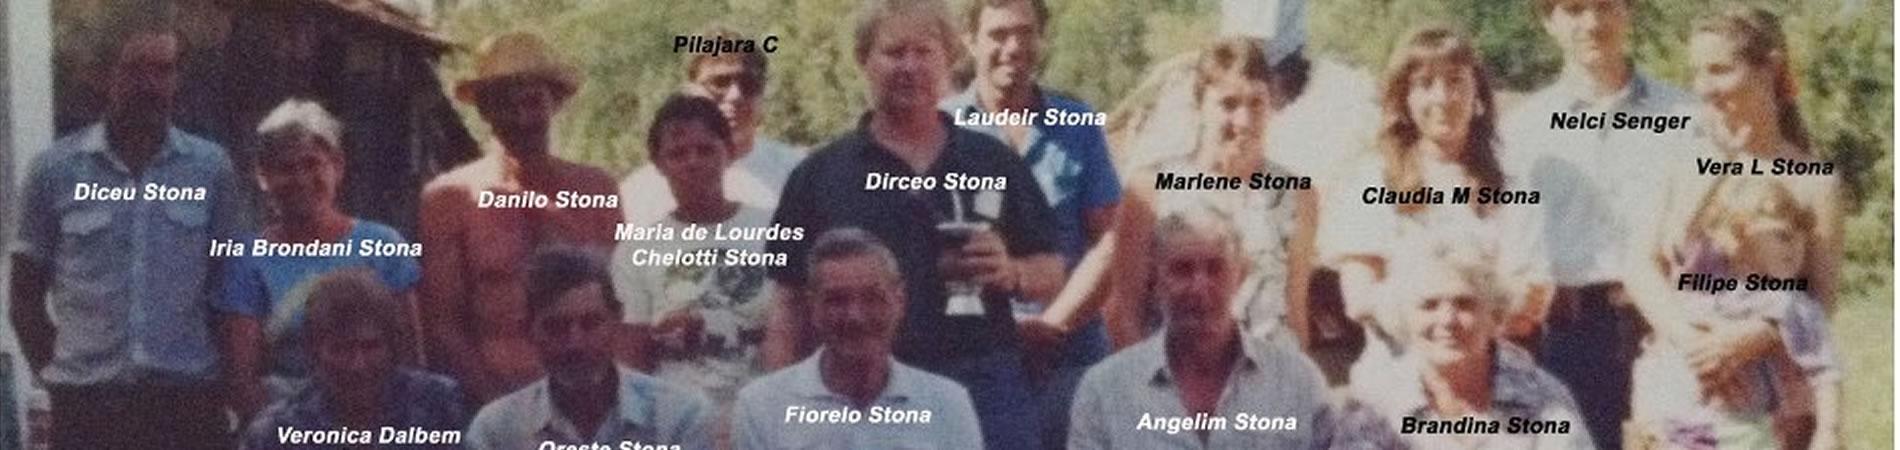 Ferramenta de busca da Família Stona